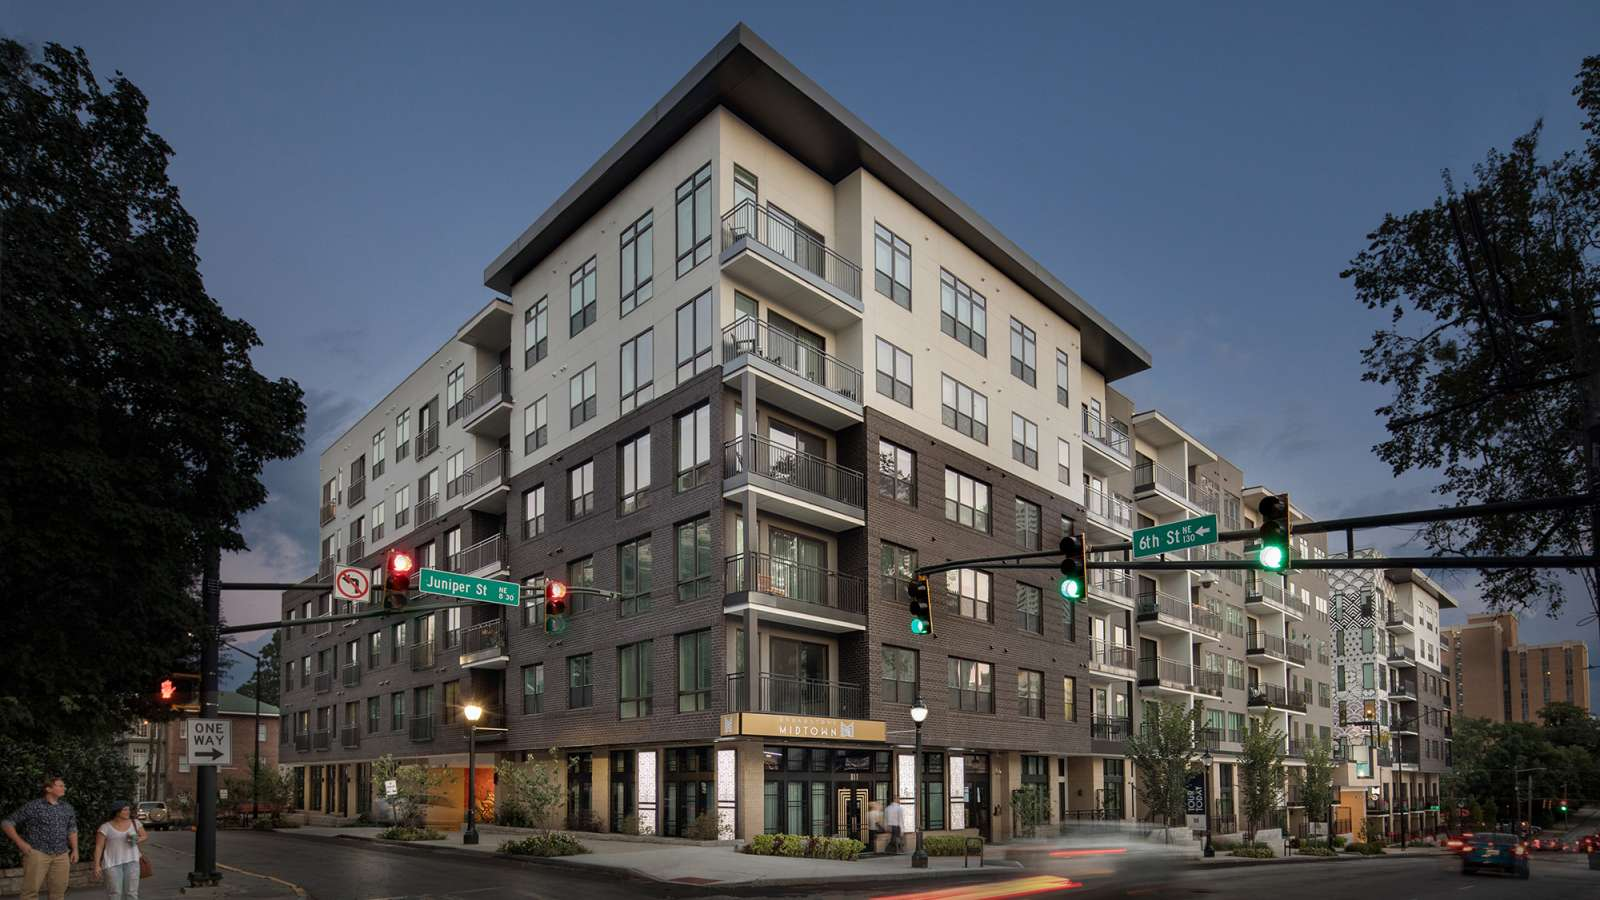 American Institute Of Architects Recognizes Best